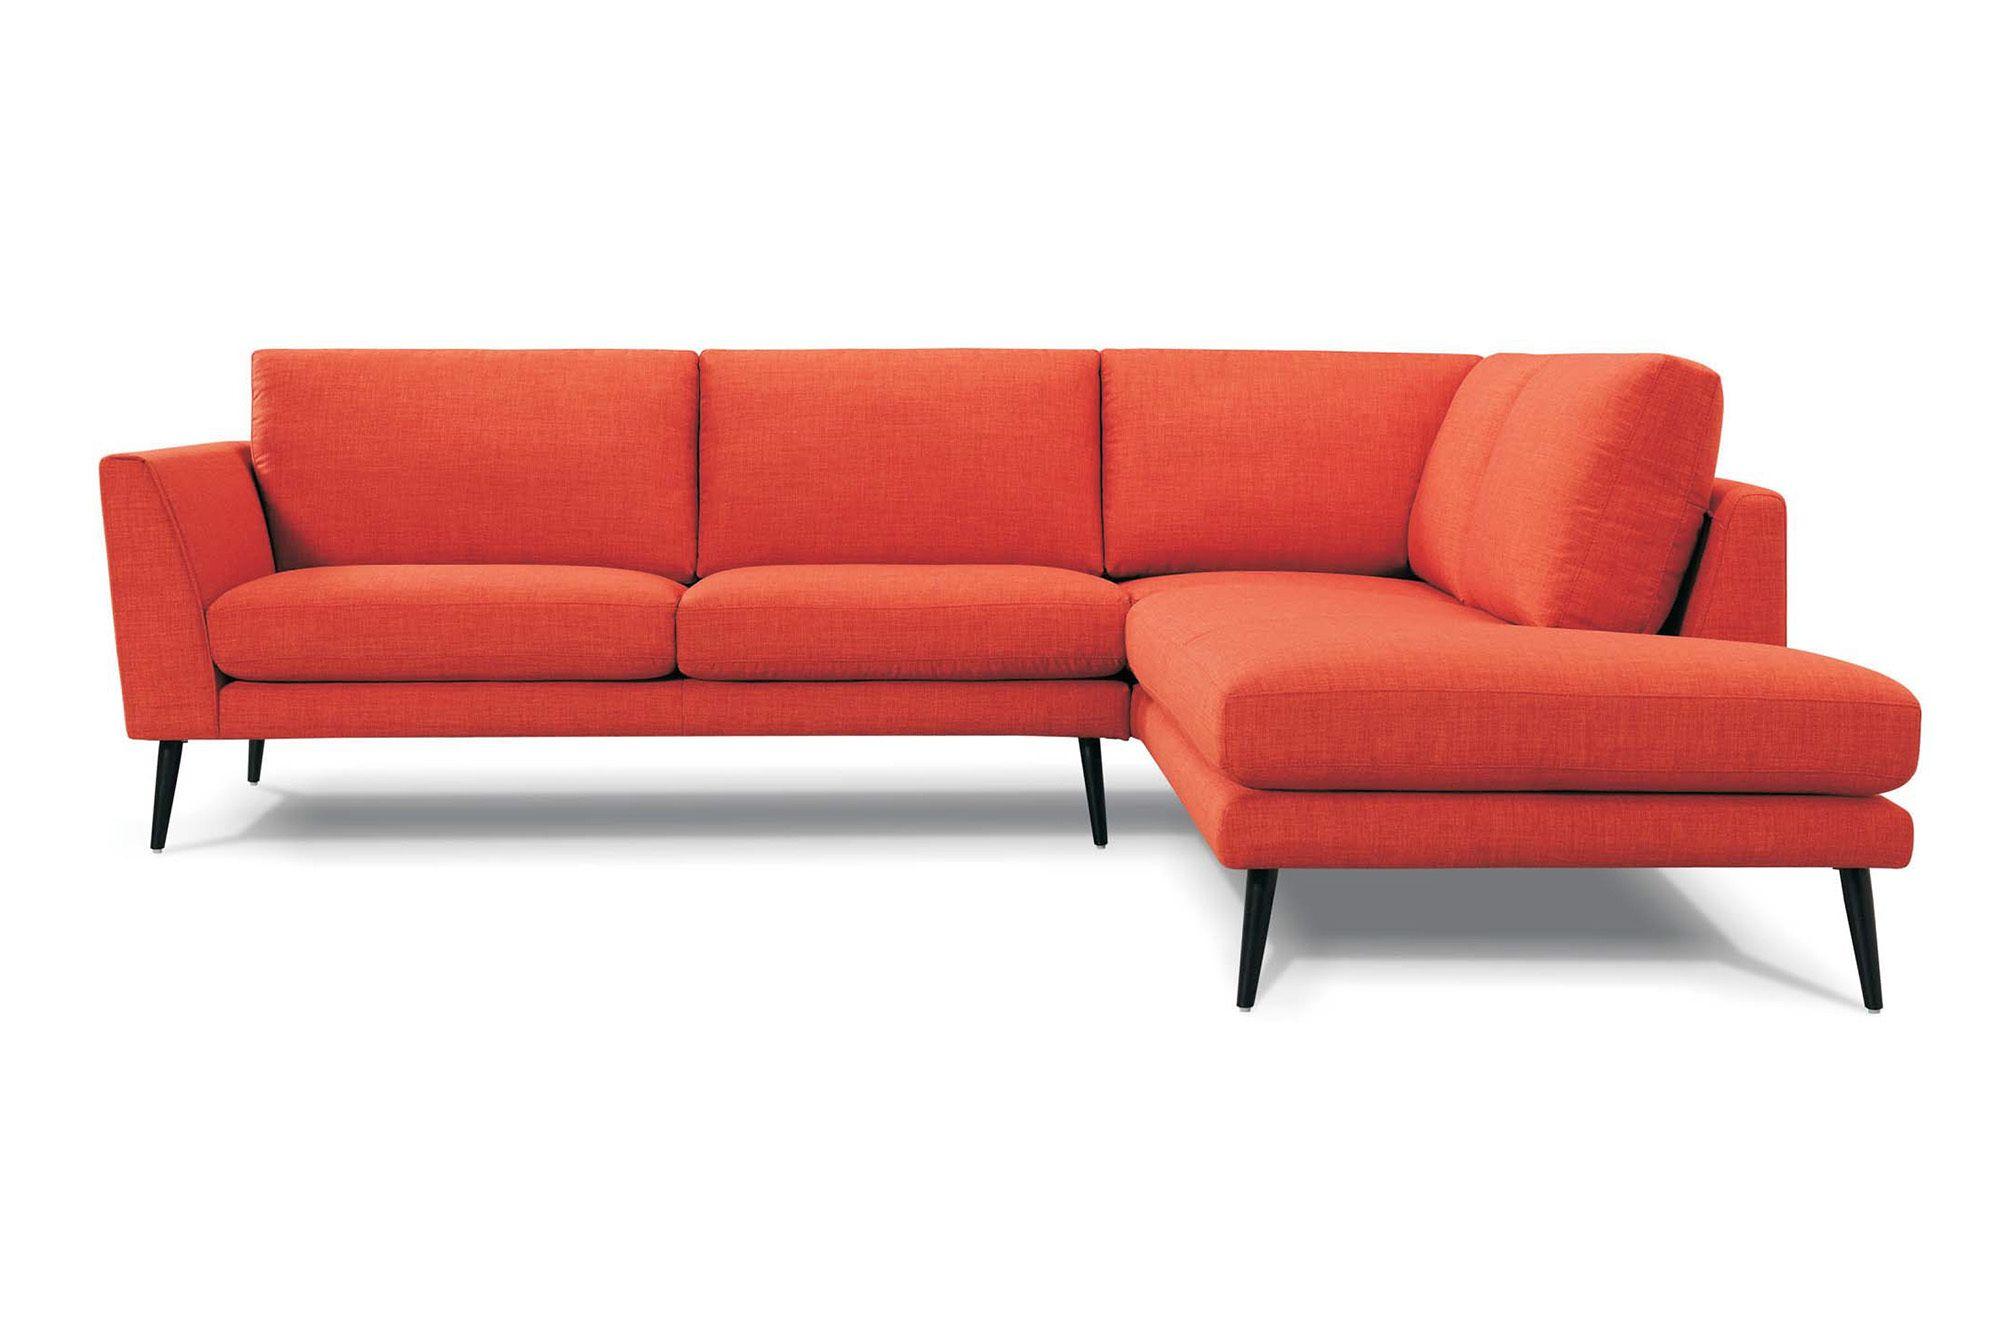 Fresno Lounge Suite | Bradfordu0027s Furniture, ...